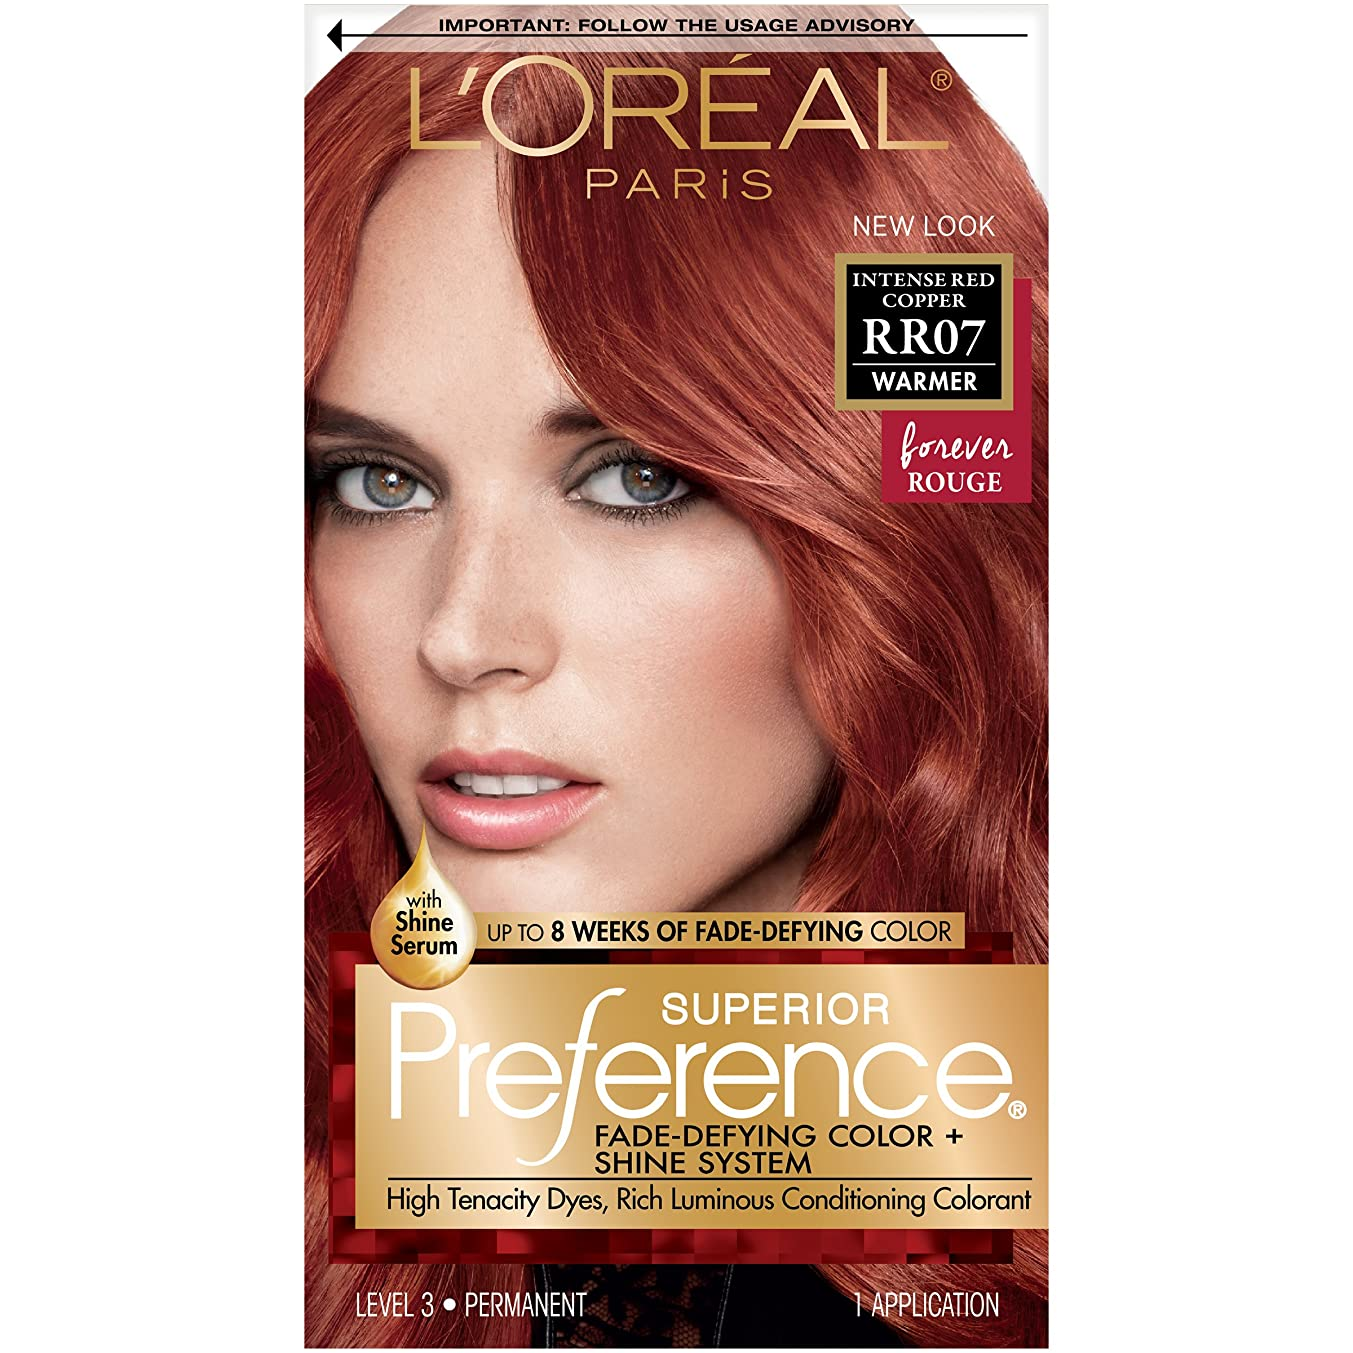 L'Oréal Paris Superior Preference Fade-Defying + Shine Permanent Hair Color, RR-07 Intense Red Copper, 1 kit Hair Dye